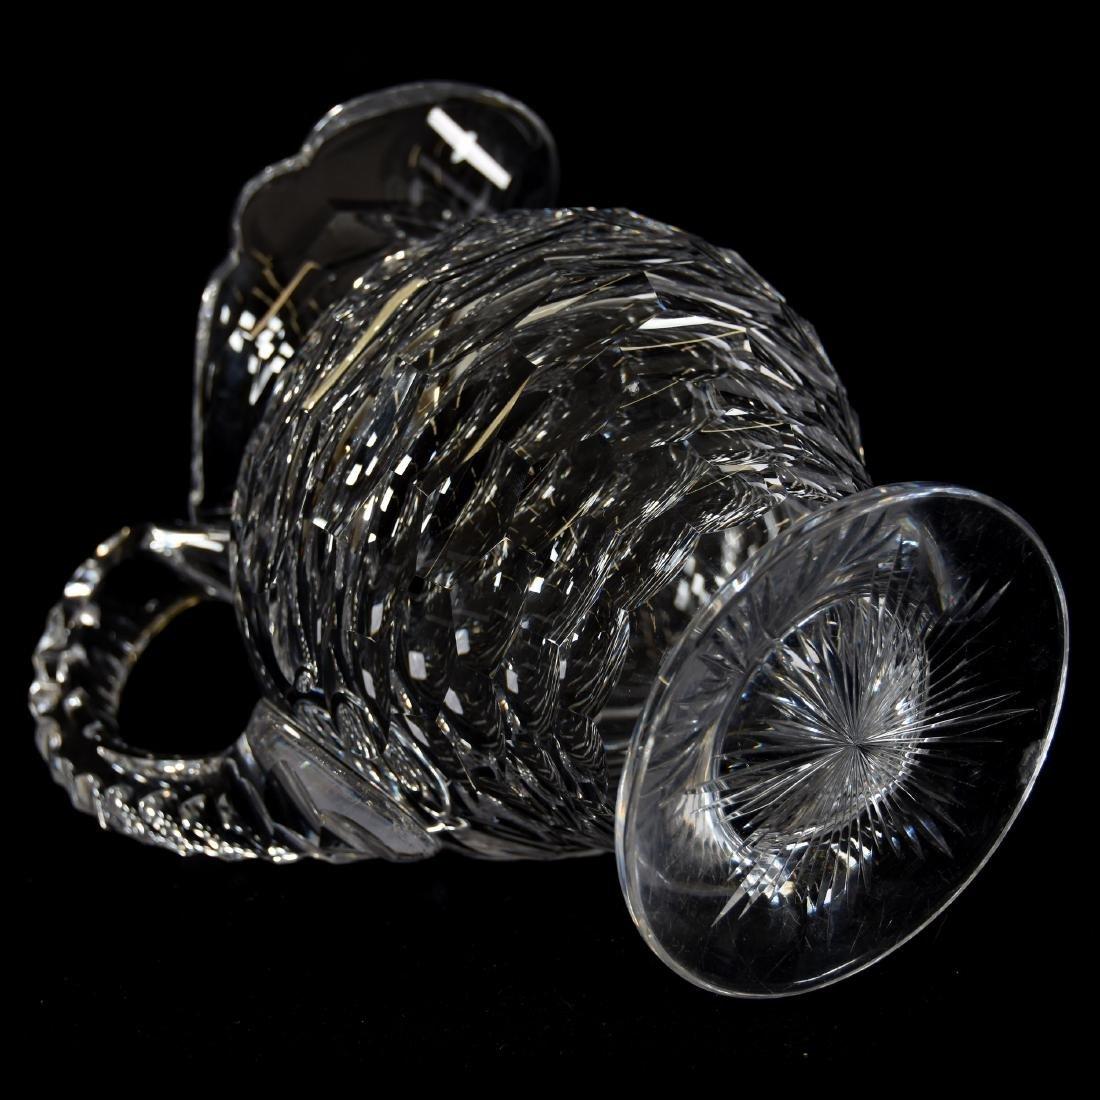 Water Pitcher, Honeycomb Pattern - 3